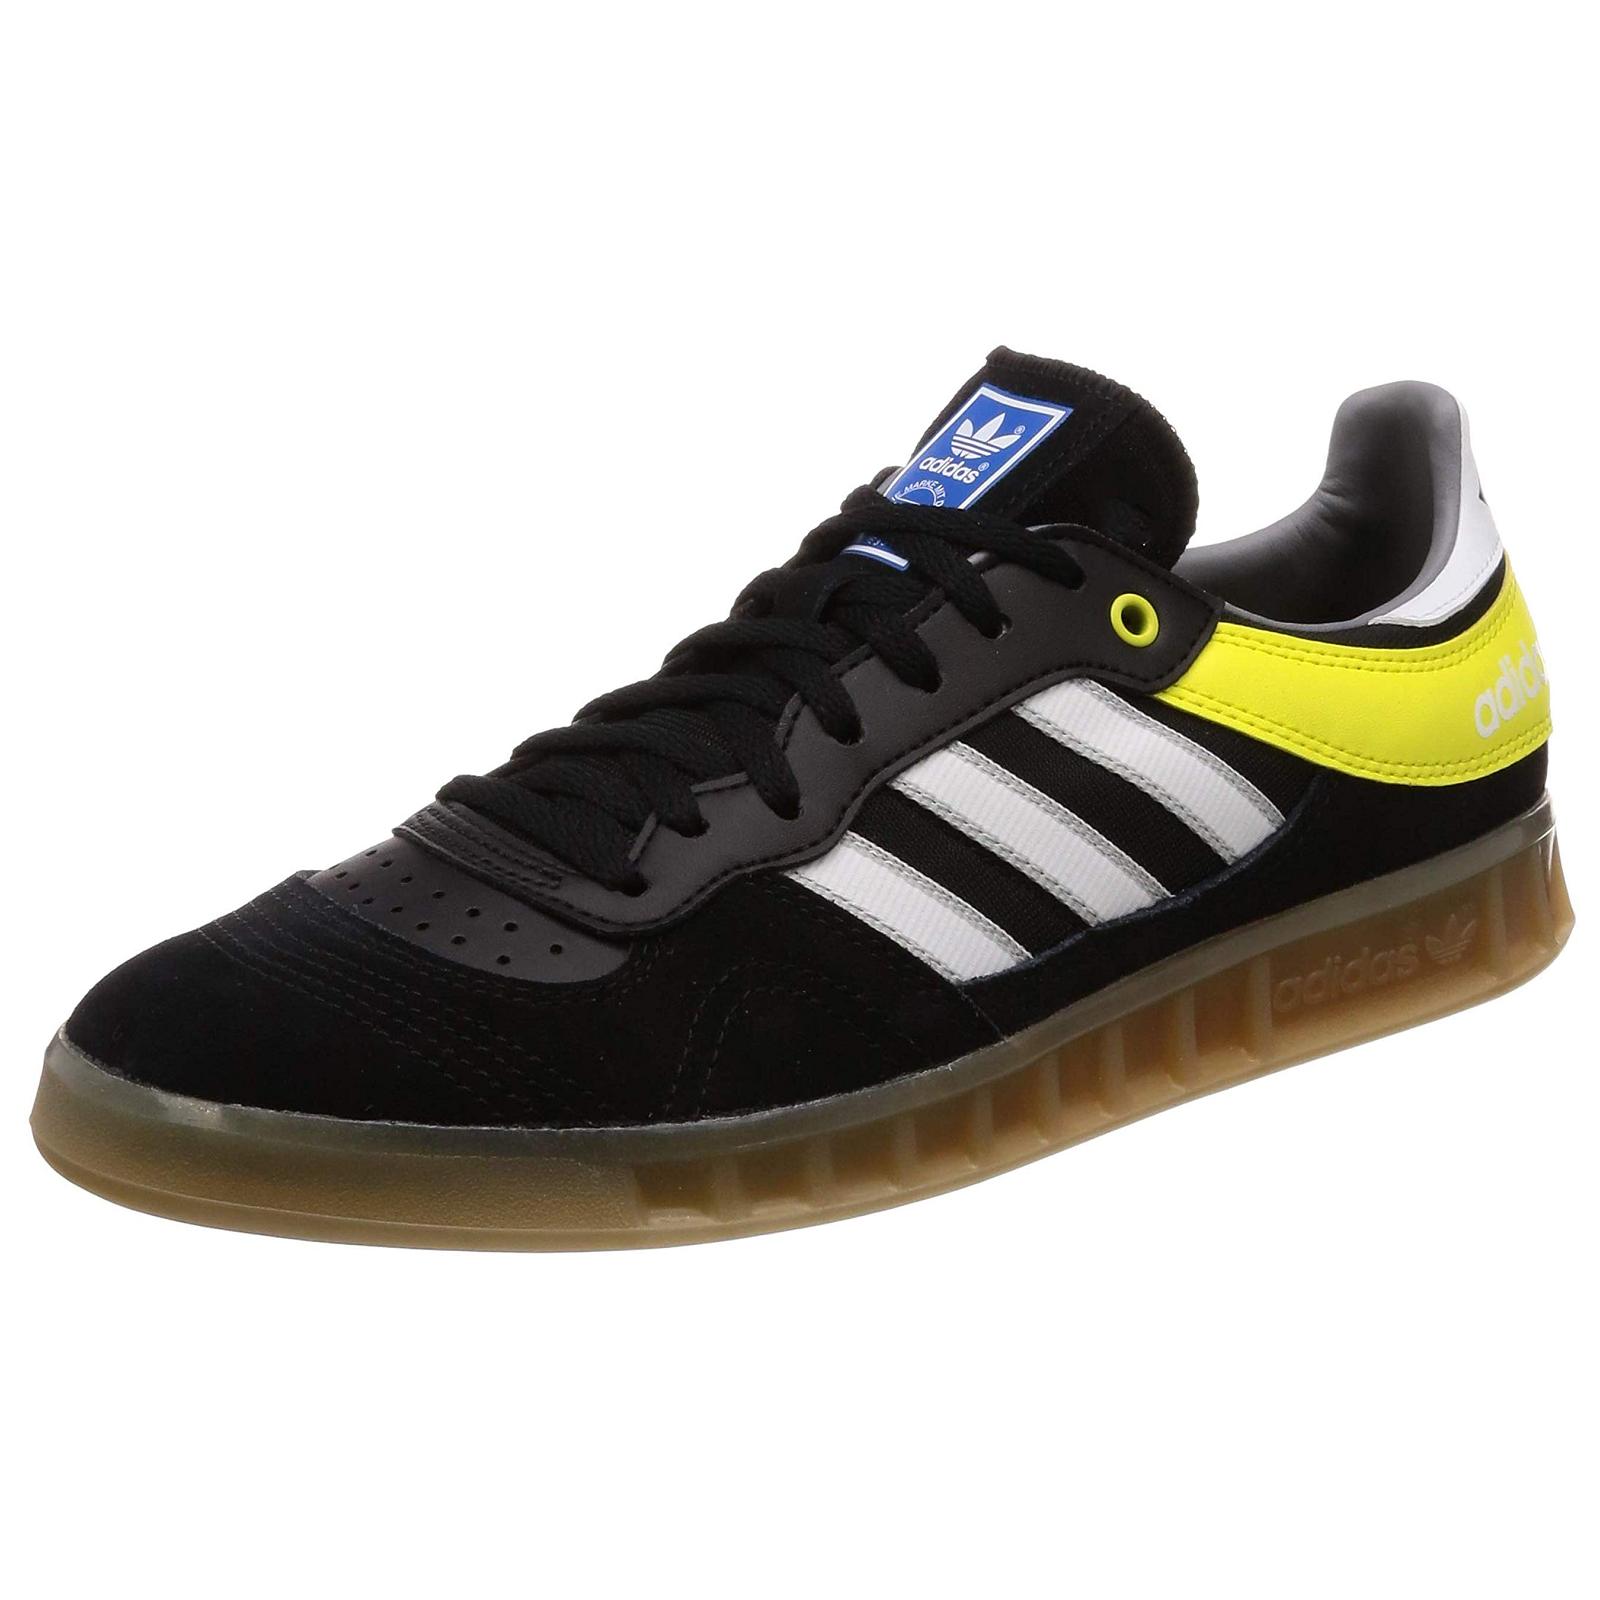 Adidas Handball Top Indoor Retro Schuhe Turnschuhe Hallenschuhe schwarz B38029